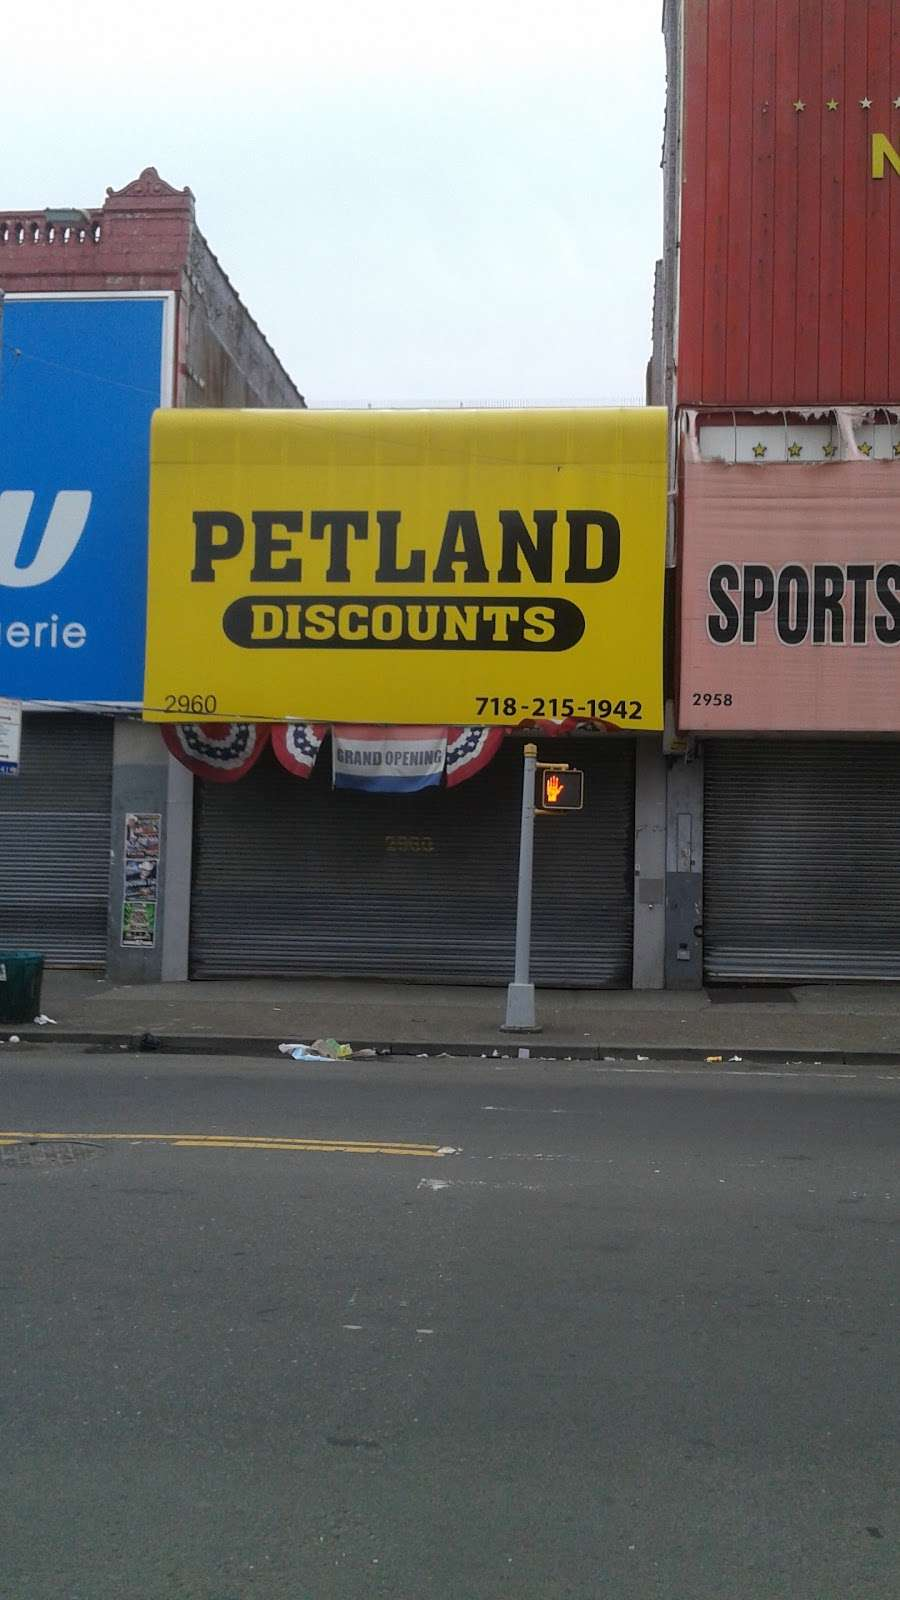 Petland Discounts - THIRD AVENUE - pet store  | Photo 1 of 1 | Address: 2960 Third Ave, Bronx, NY 10455, USA | Phone: (718) 215-1942